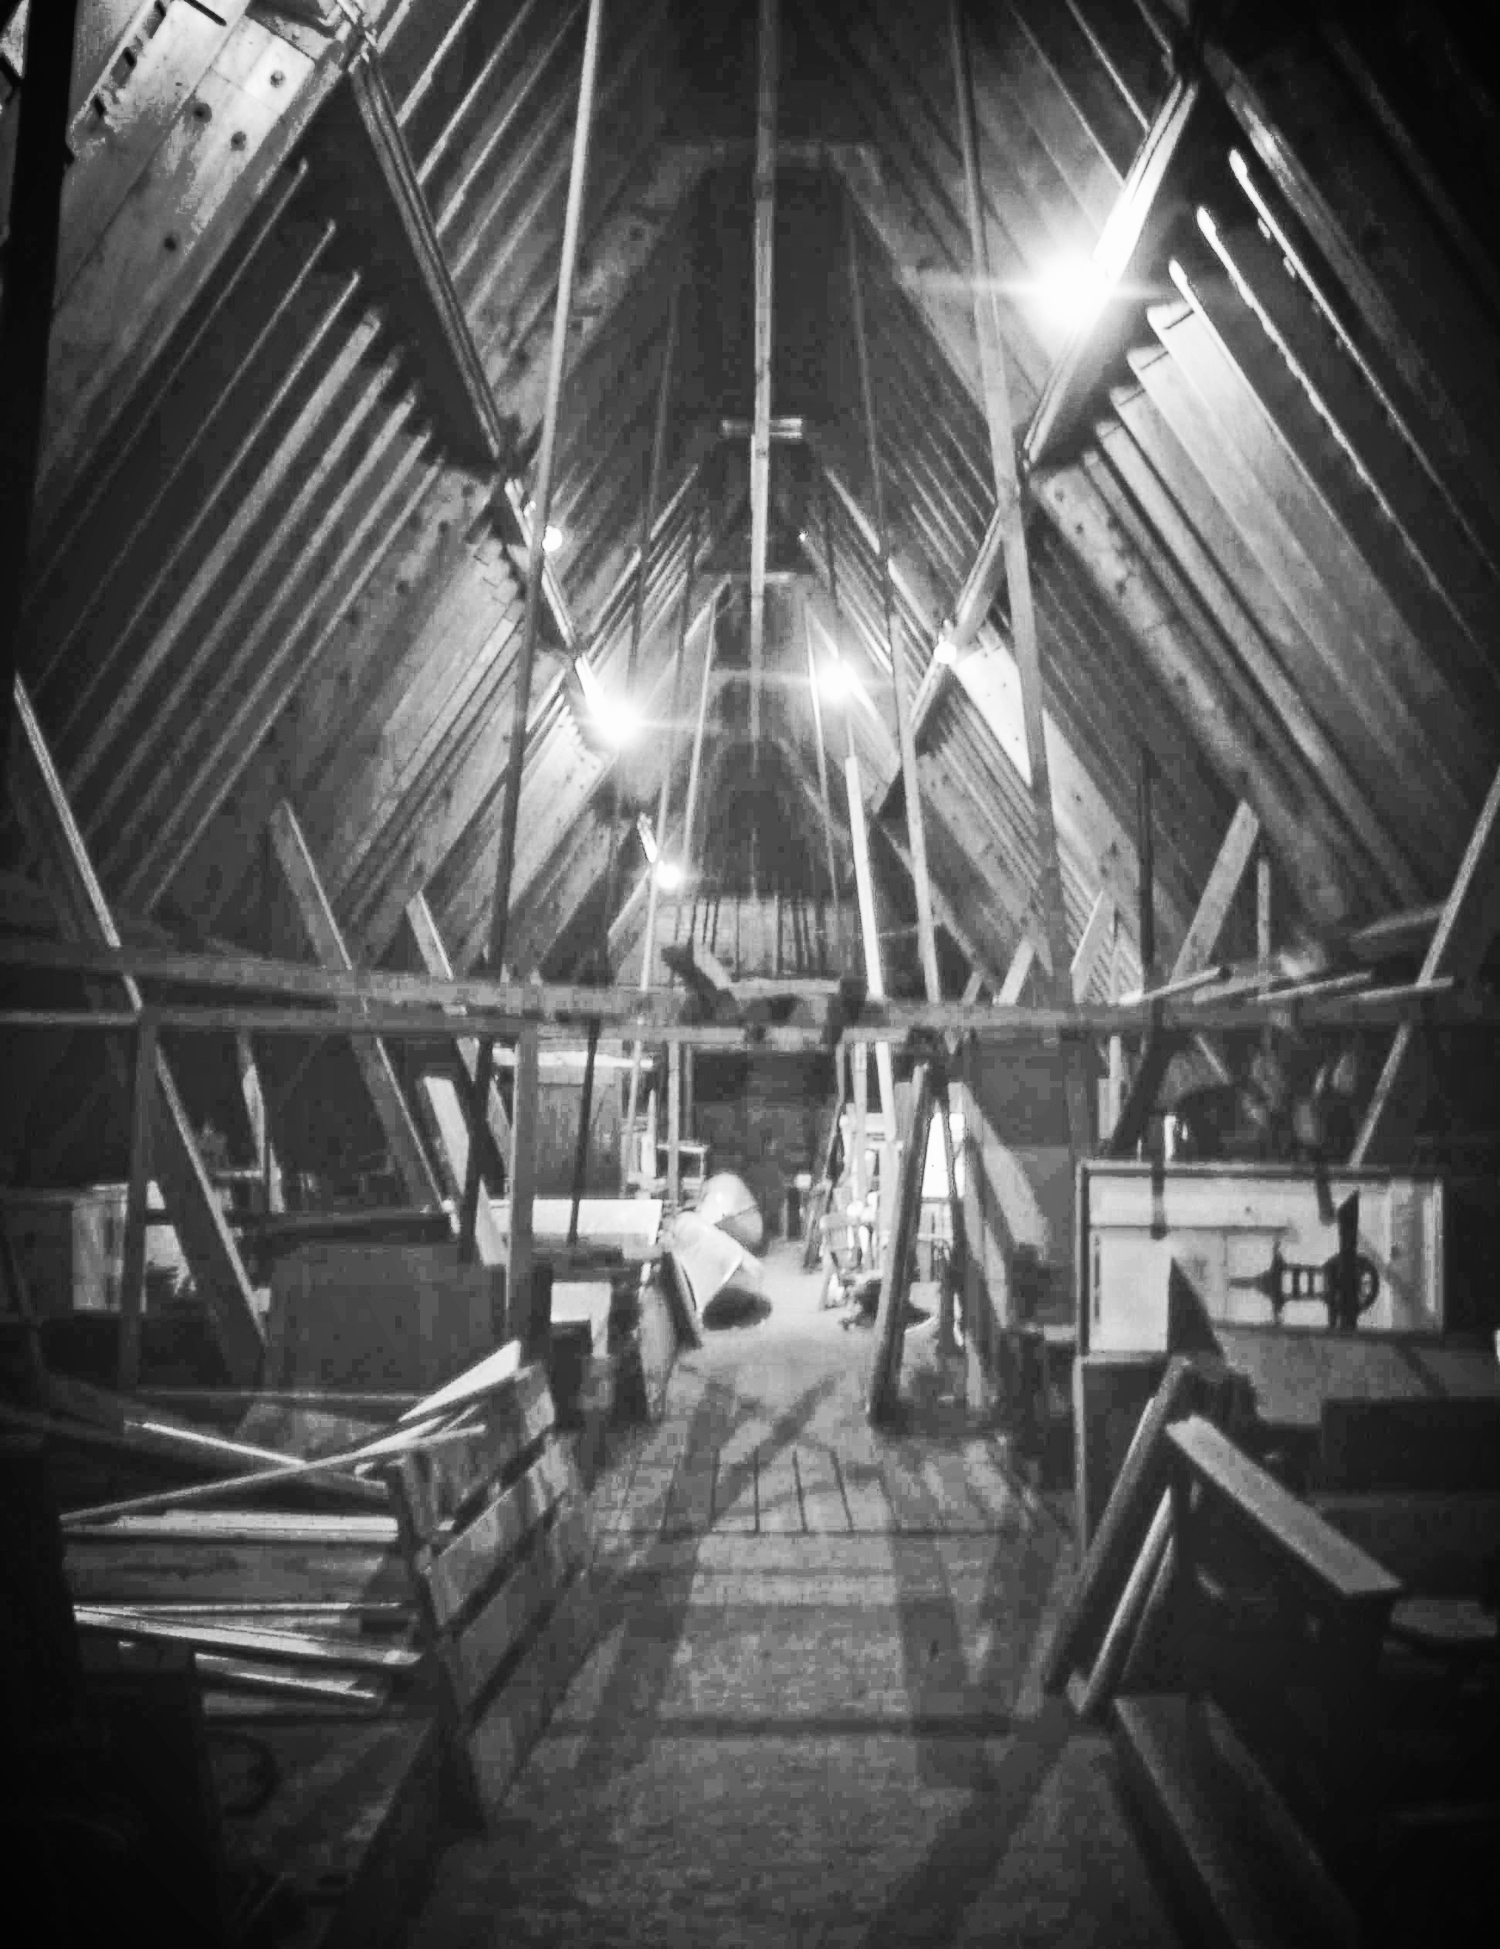 Interior of the Car Barn